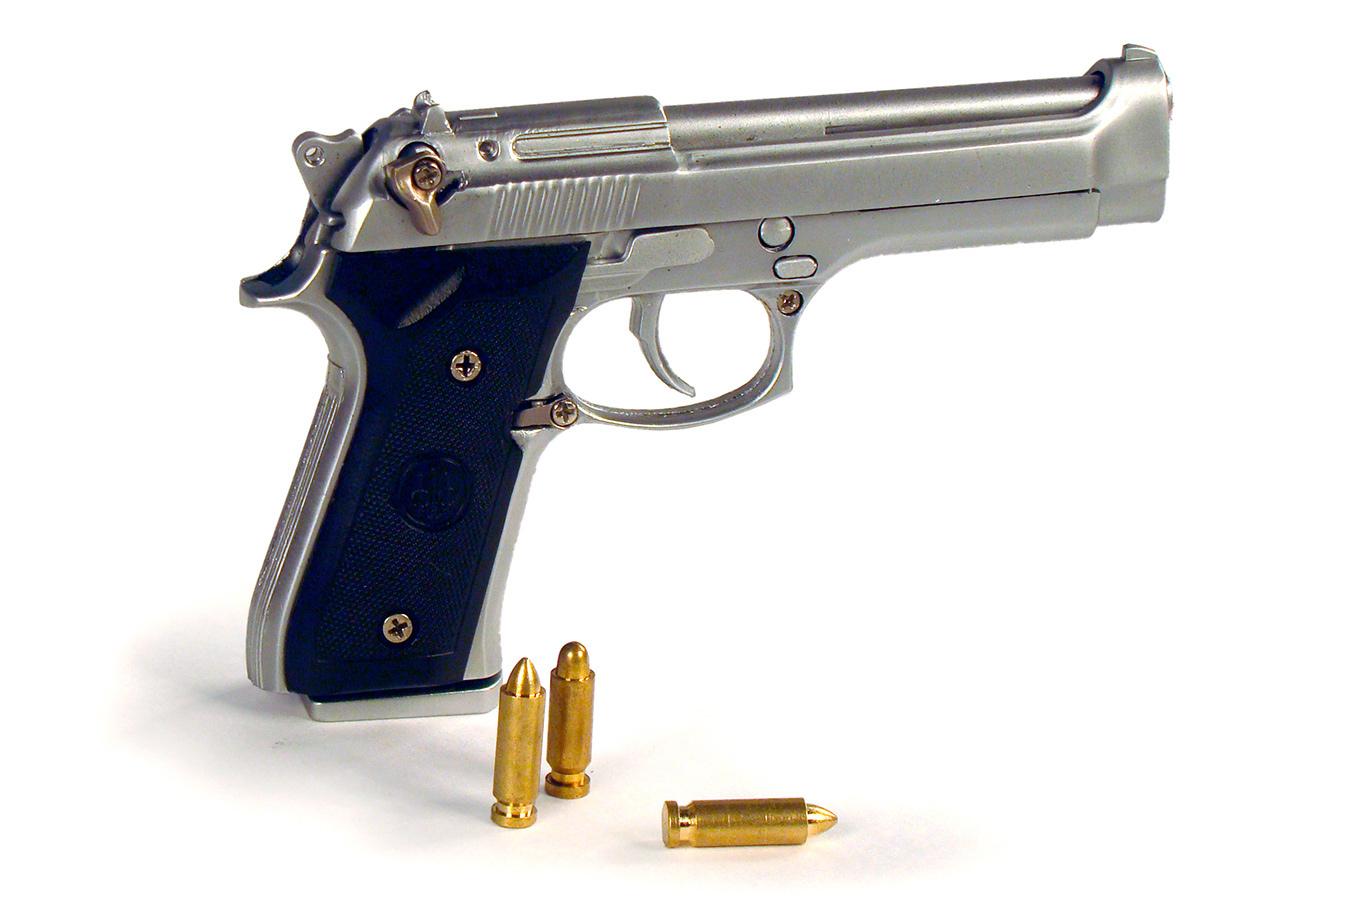 Макет пистолета Beretta 92FS в масштабе 1:3 [PDMA12]